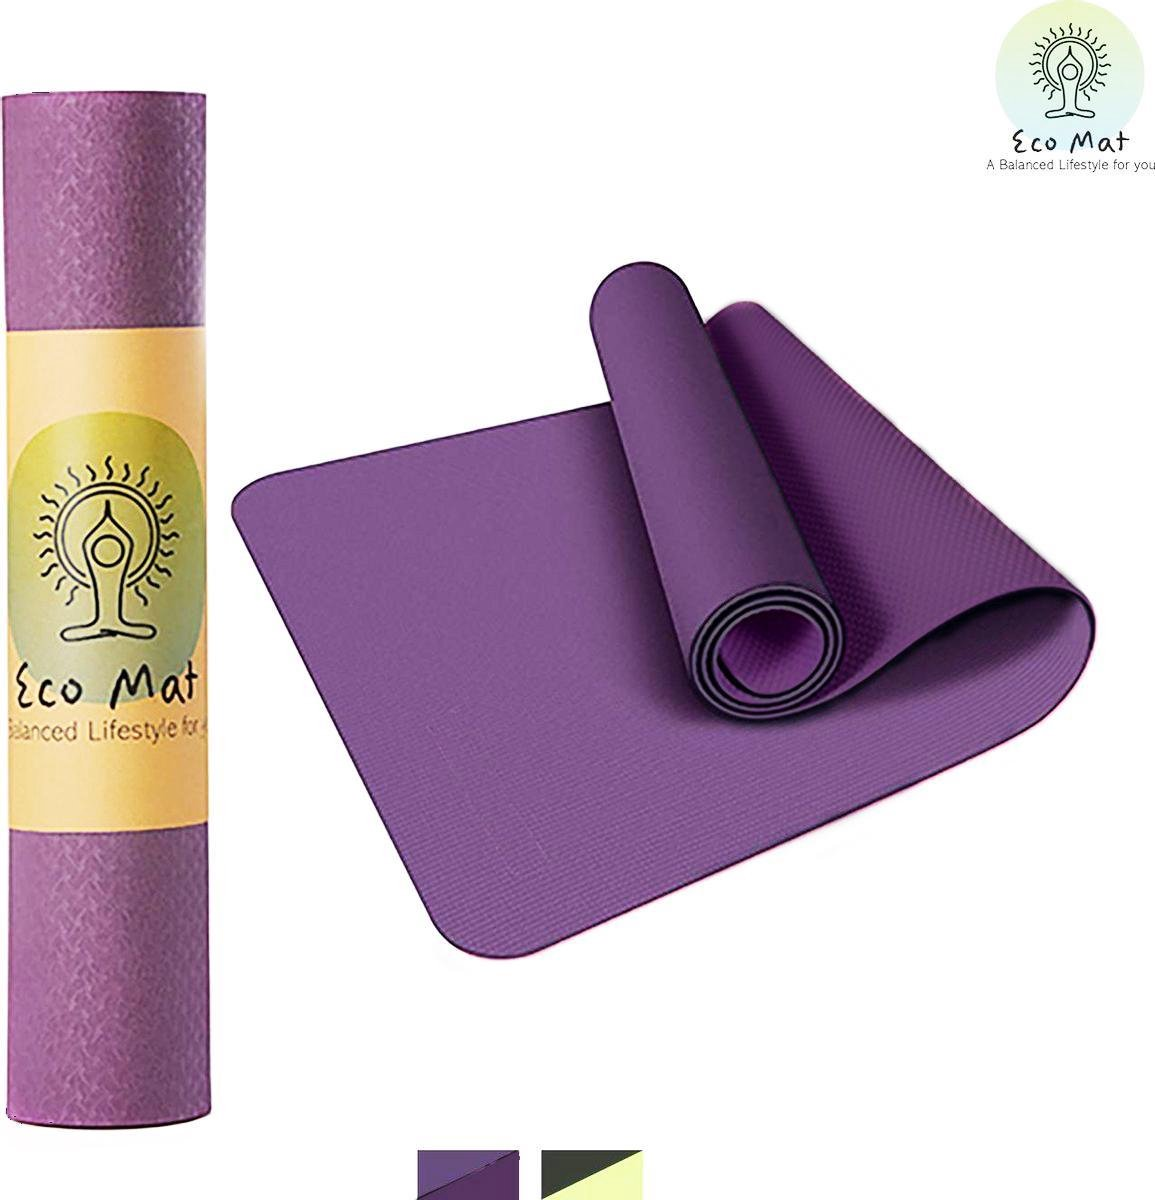 Eco Yoga Mat - Inclusief Draagriem - Anti Slip - Extra Dik (6 mm) - 61 x 183 x 0,6 cm - Paars - Dive